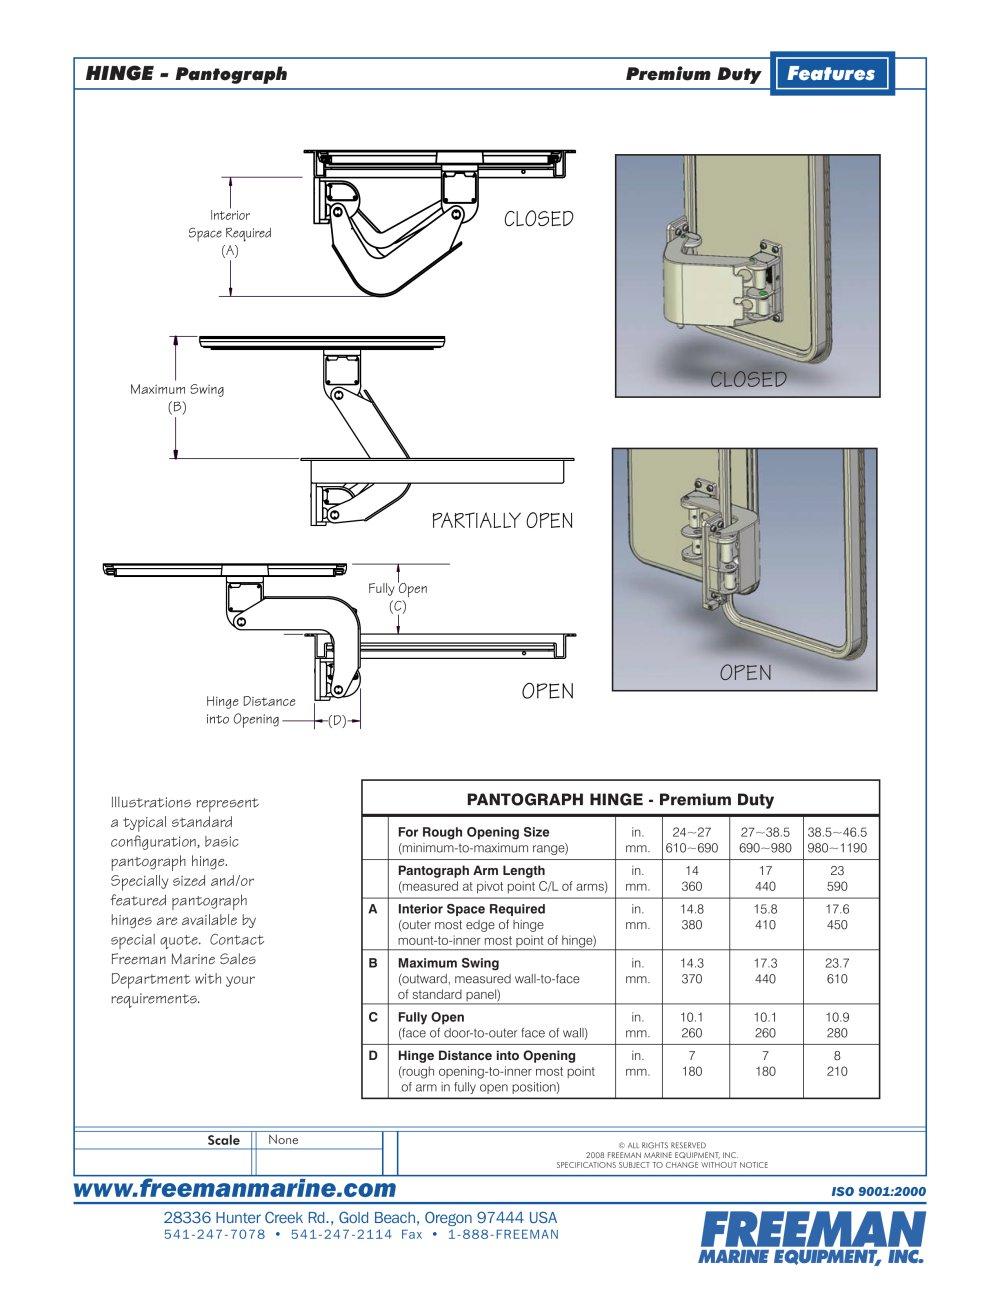 Pantograph Hinge - 1 / 6 Pages  sc 1 st  Catalogues Nauticexpo & Pantograph Hinge - Freeman Marine Equipment - PDF Catalogues ... pezcame.com